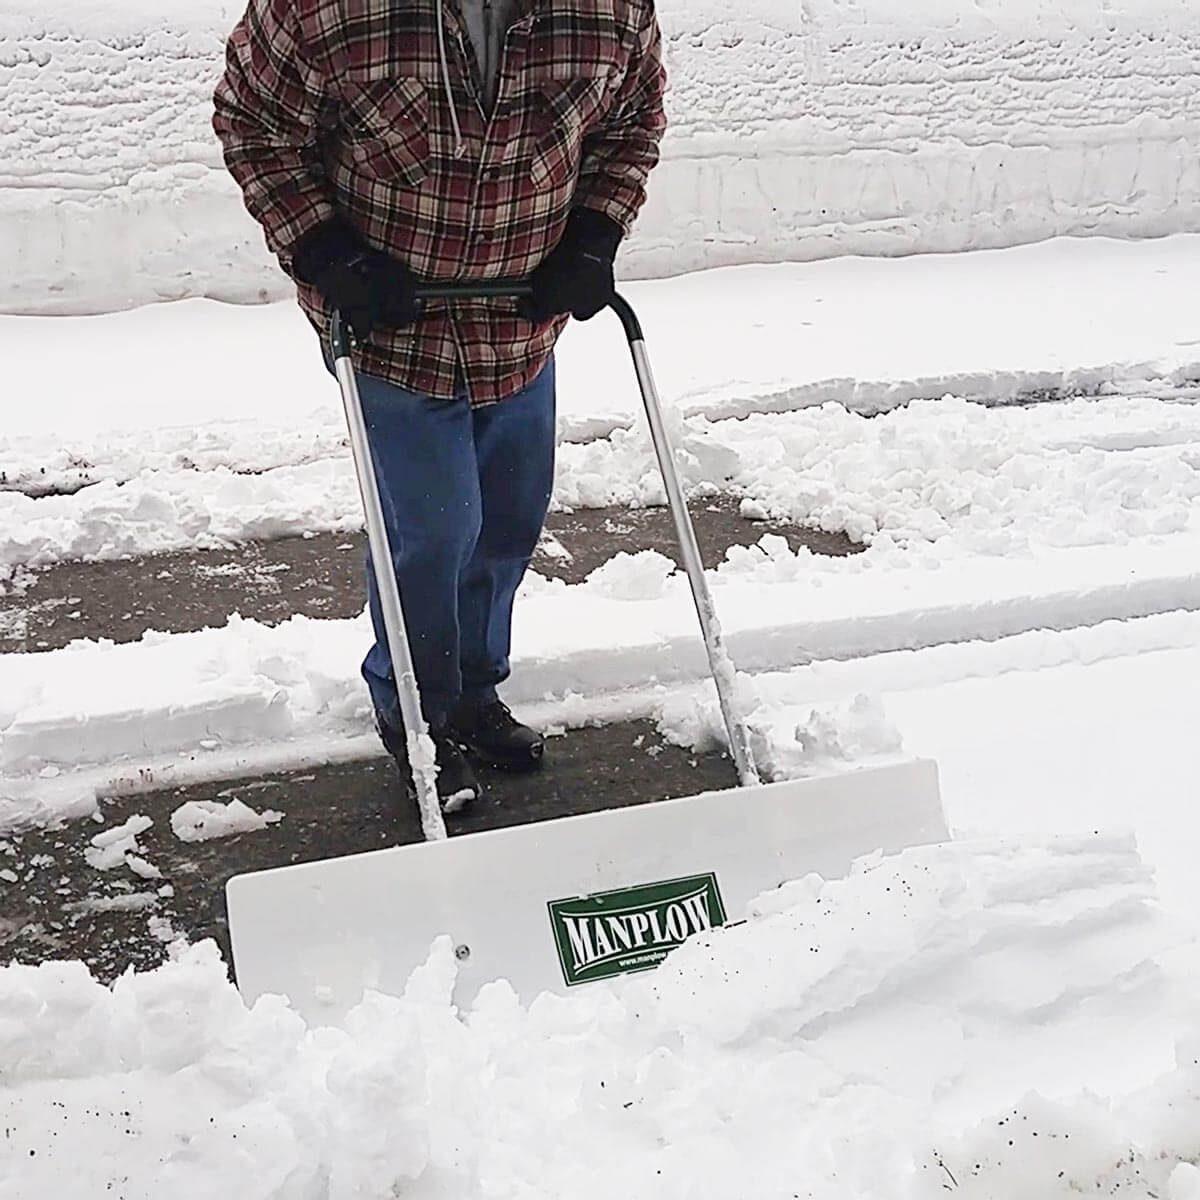 manplowhandplow snow plow tool driveway